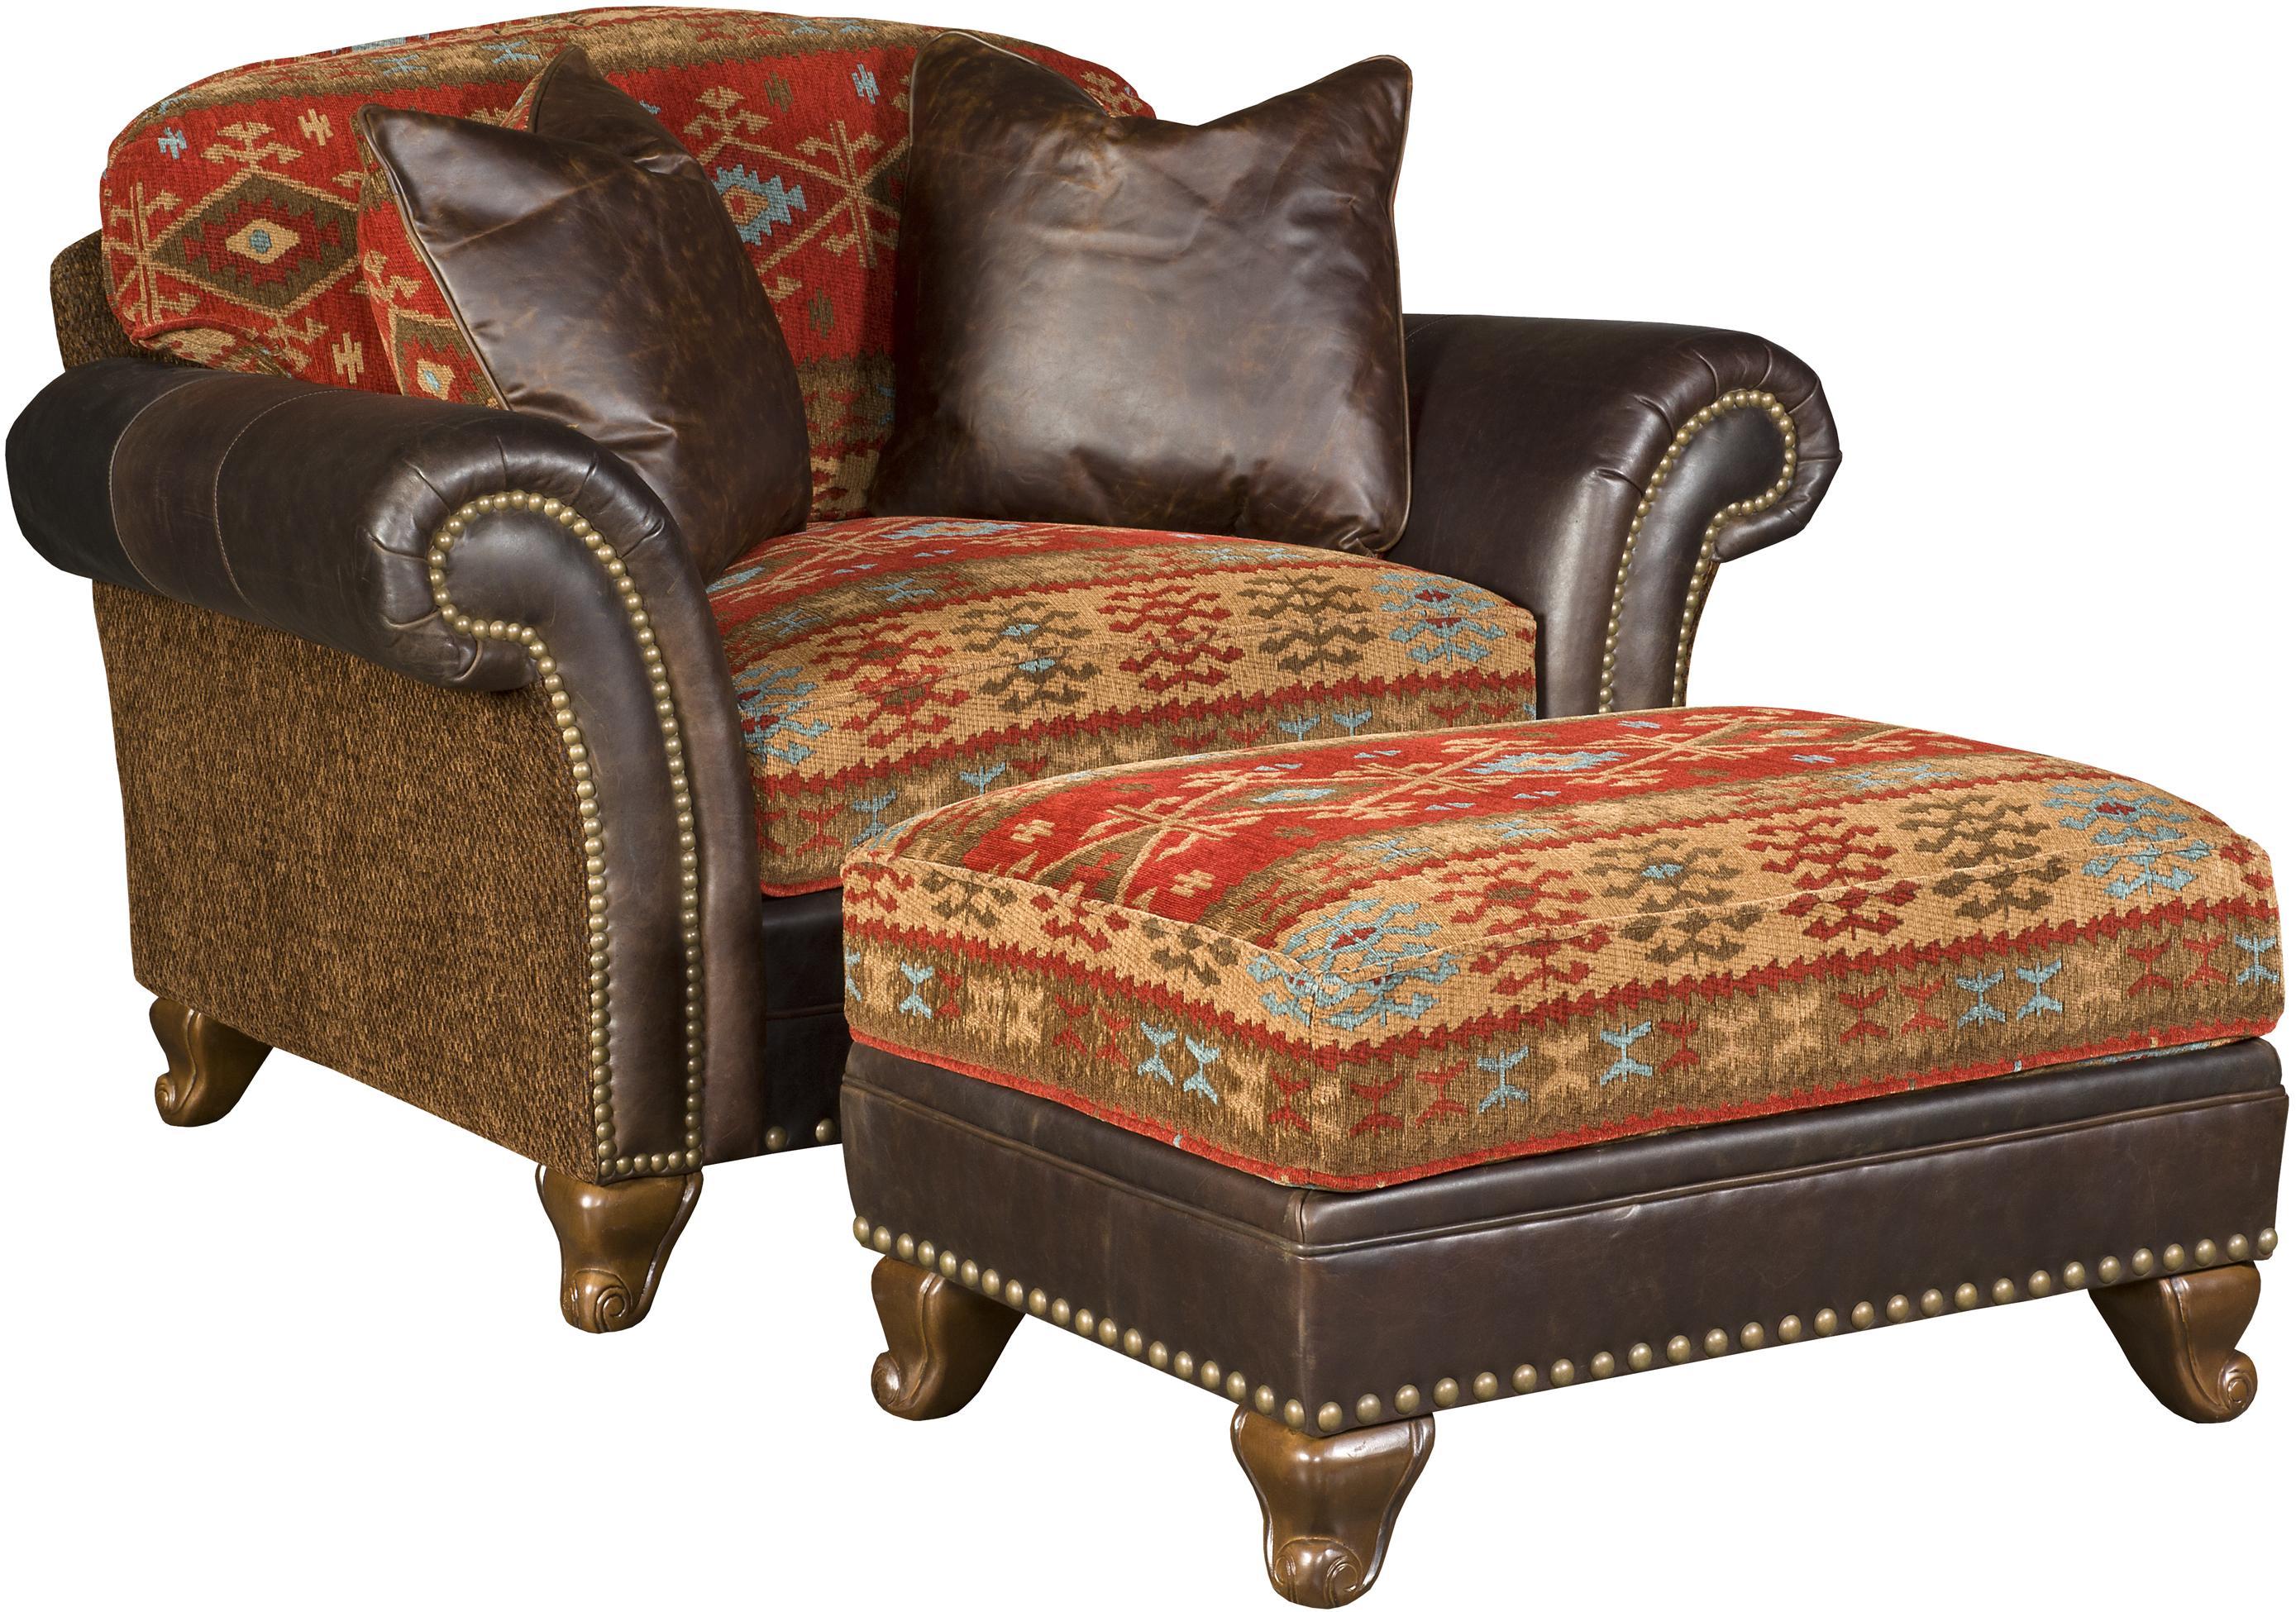 Charmant King Hickory Katherine Traditional Chair And A Half And Ottoman With  Nailhead Trim